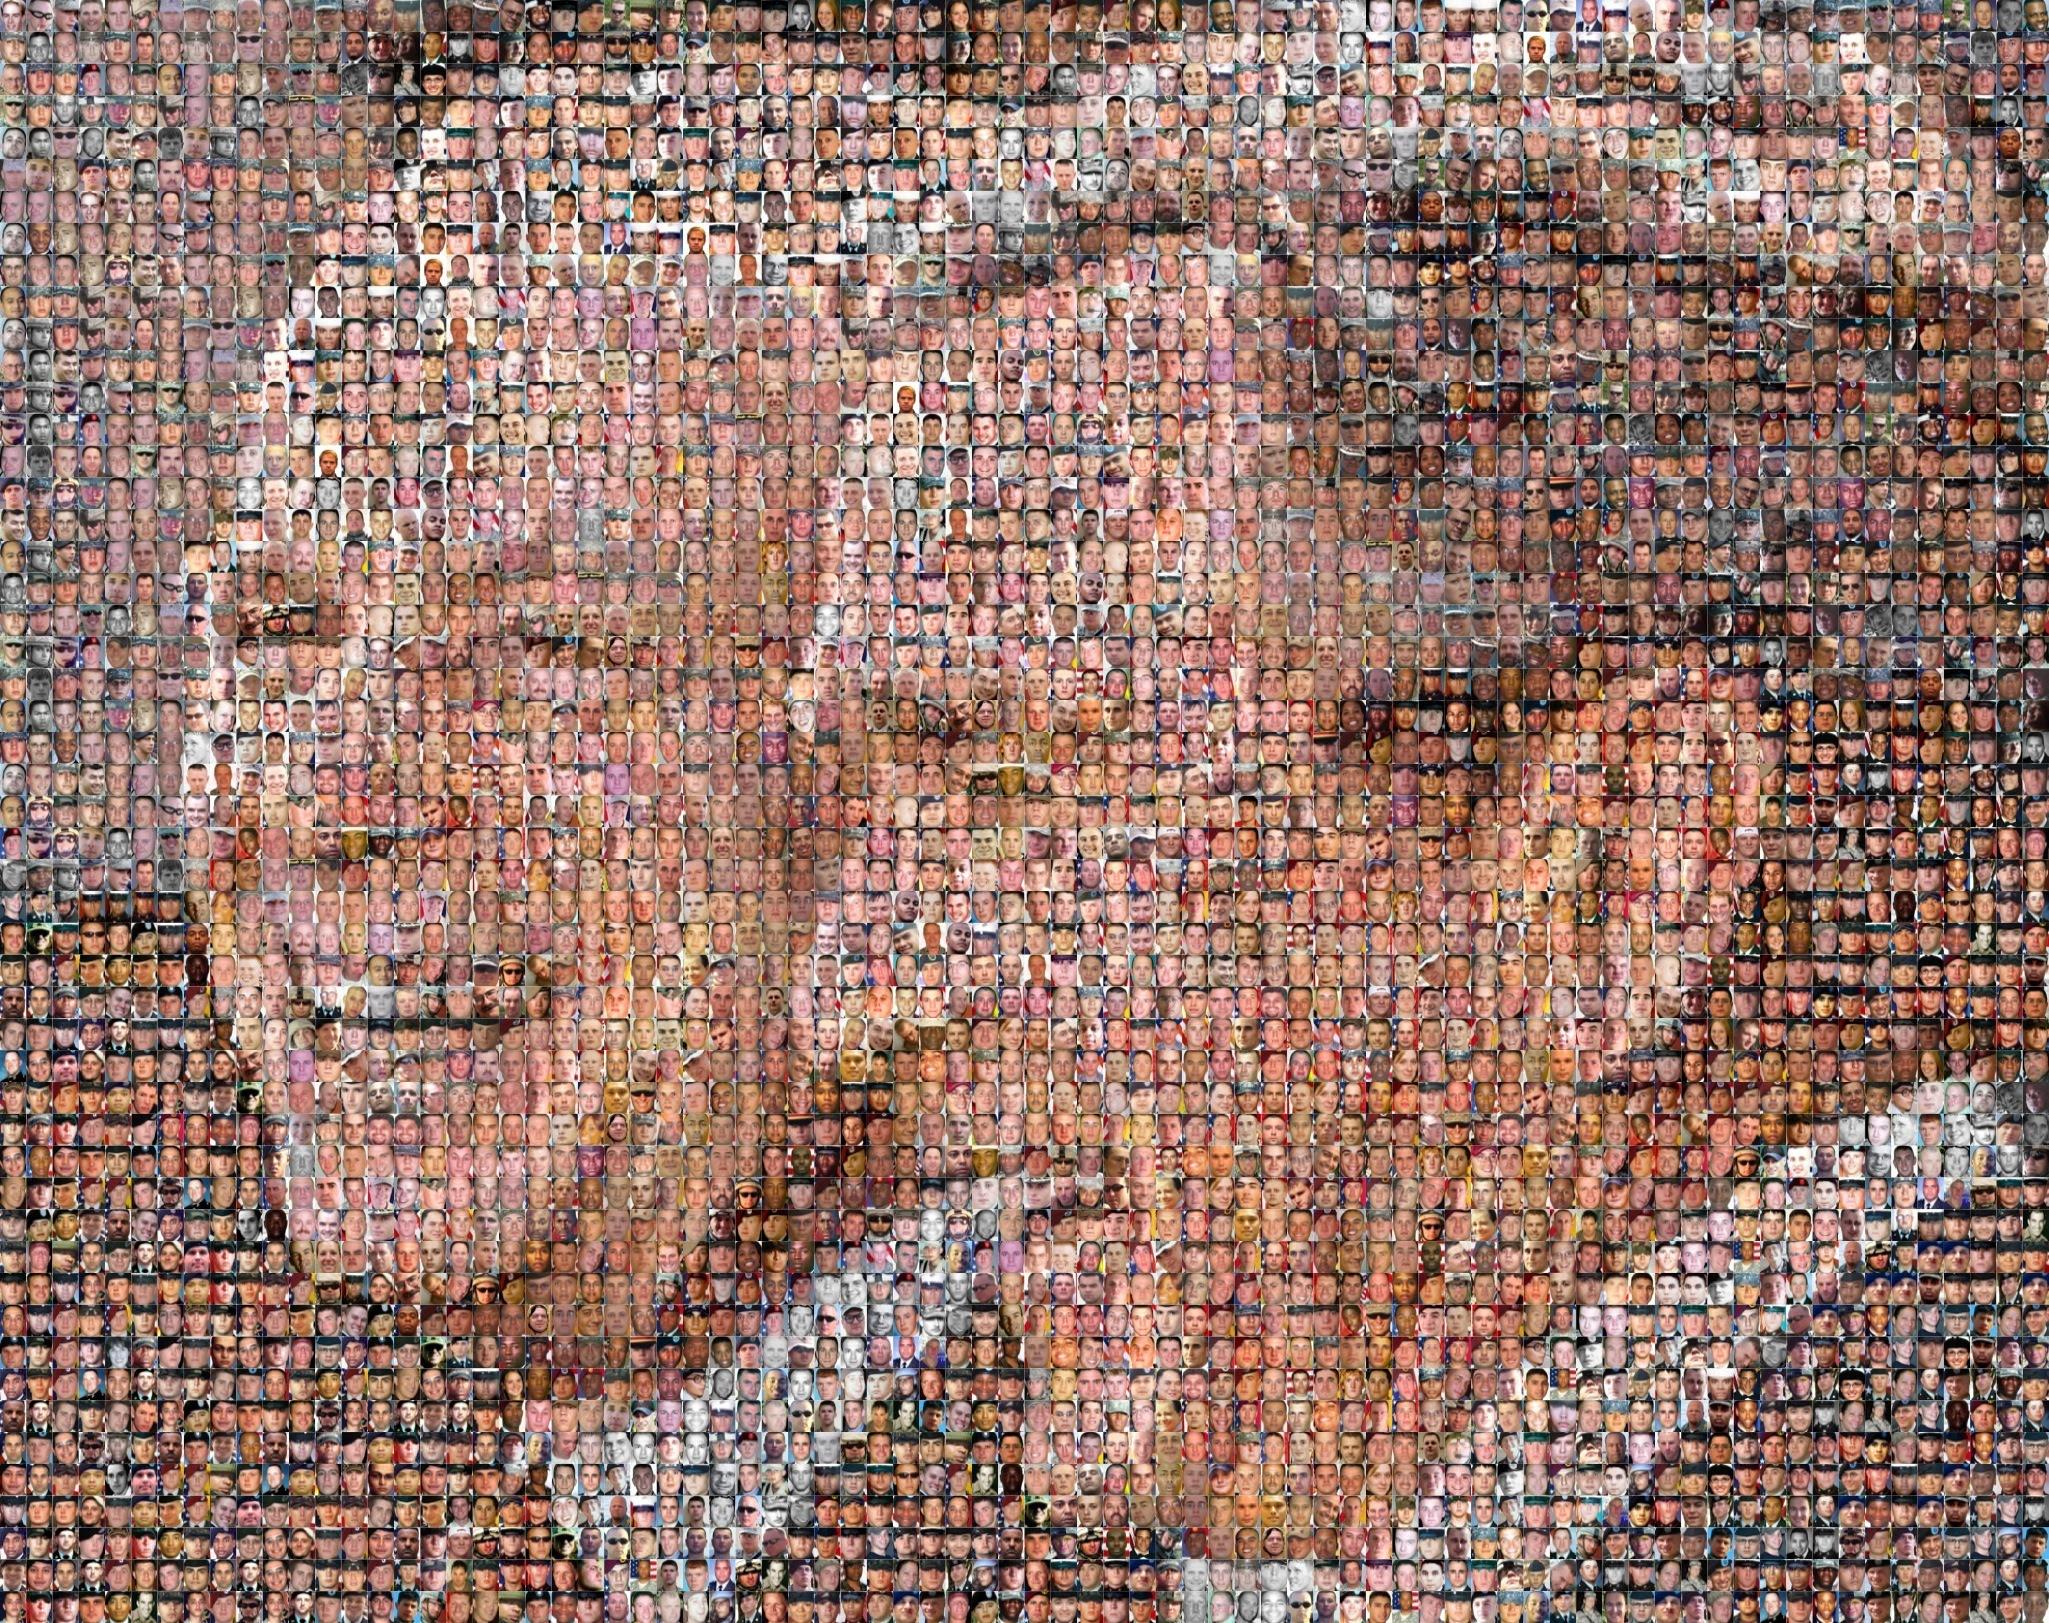 http://images.huffingtonpost.com/gen/15983/original.jpg